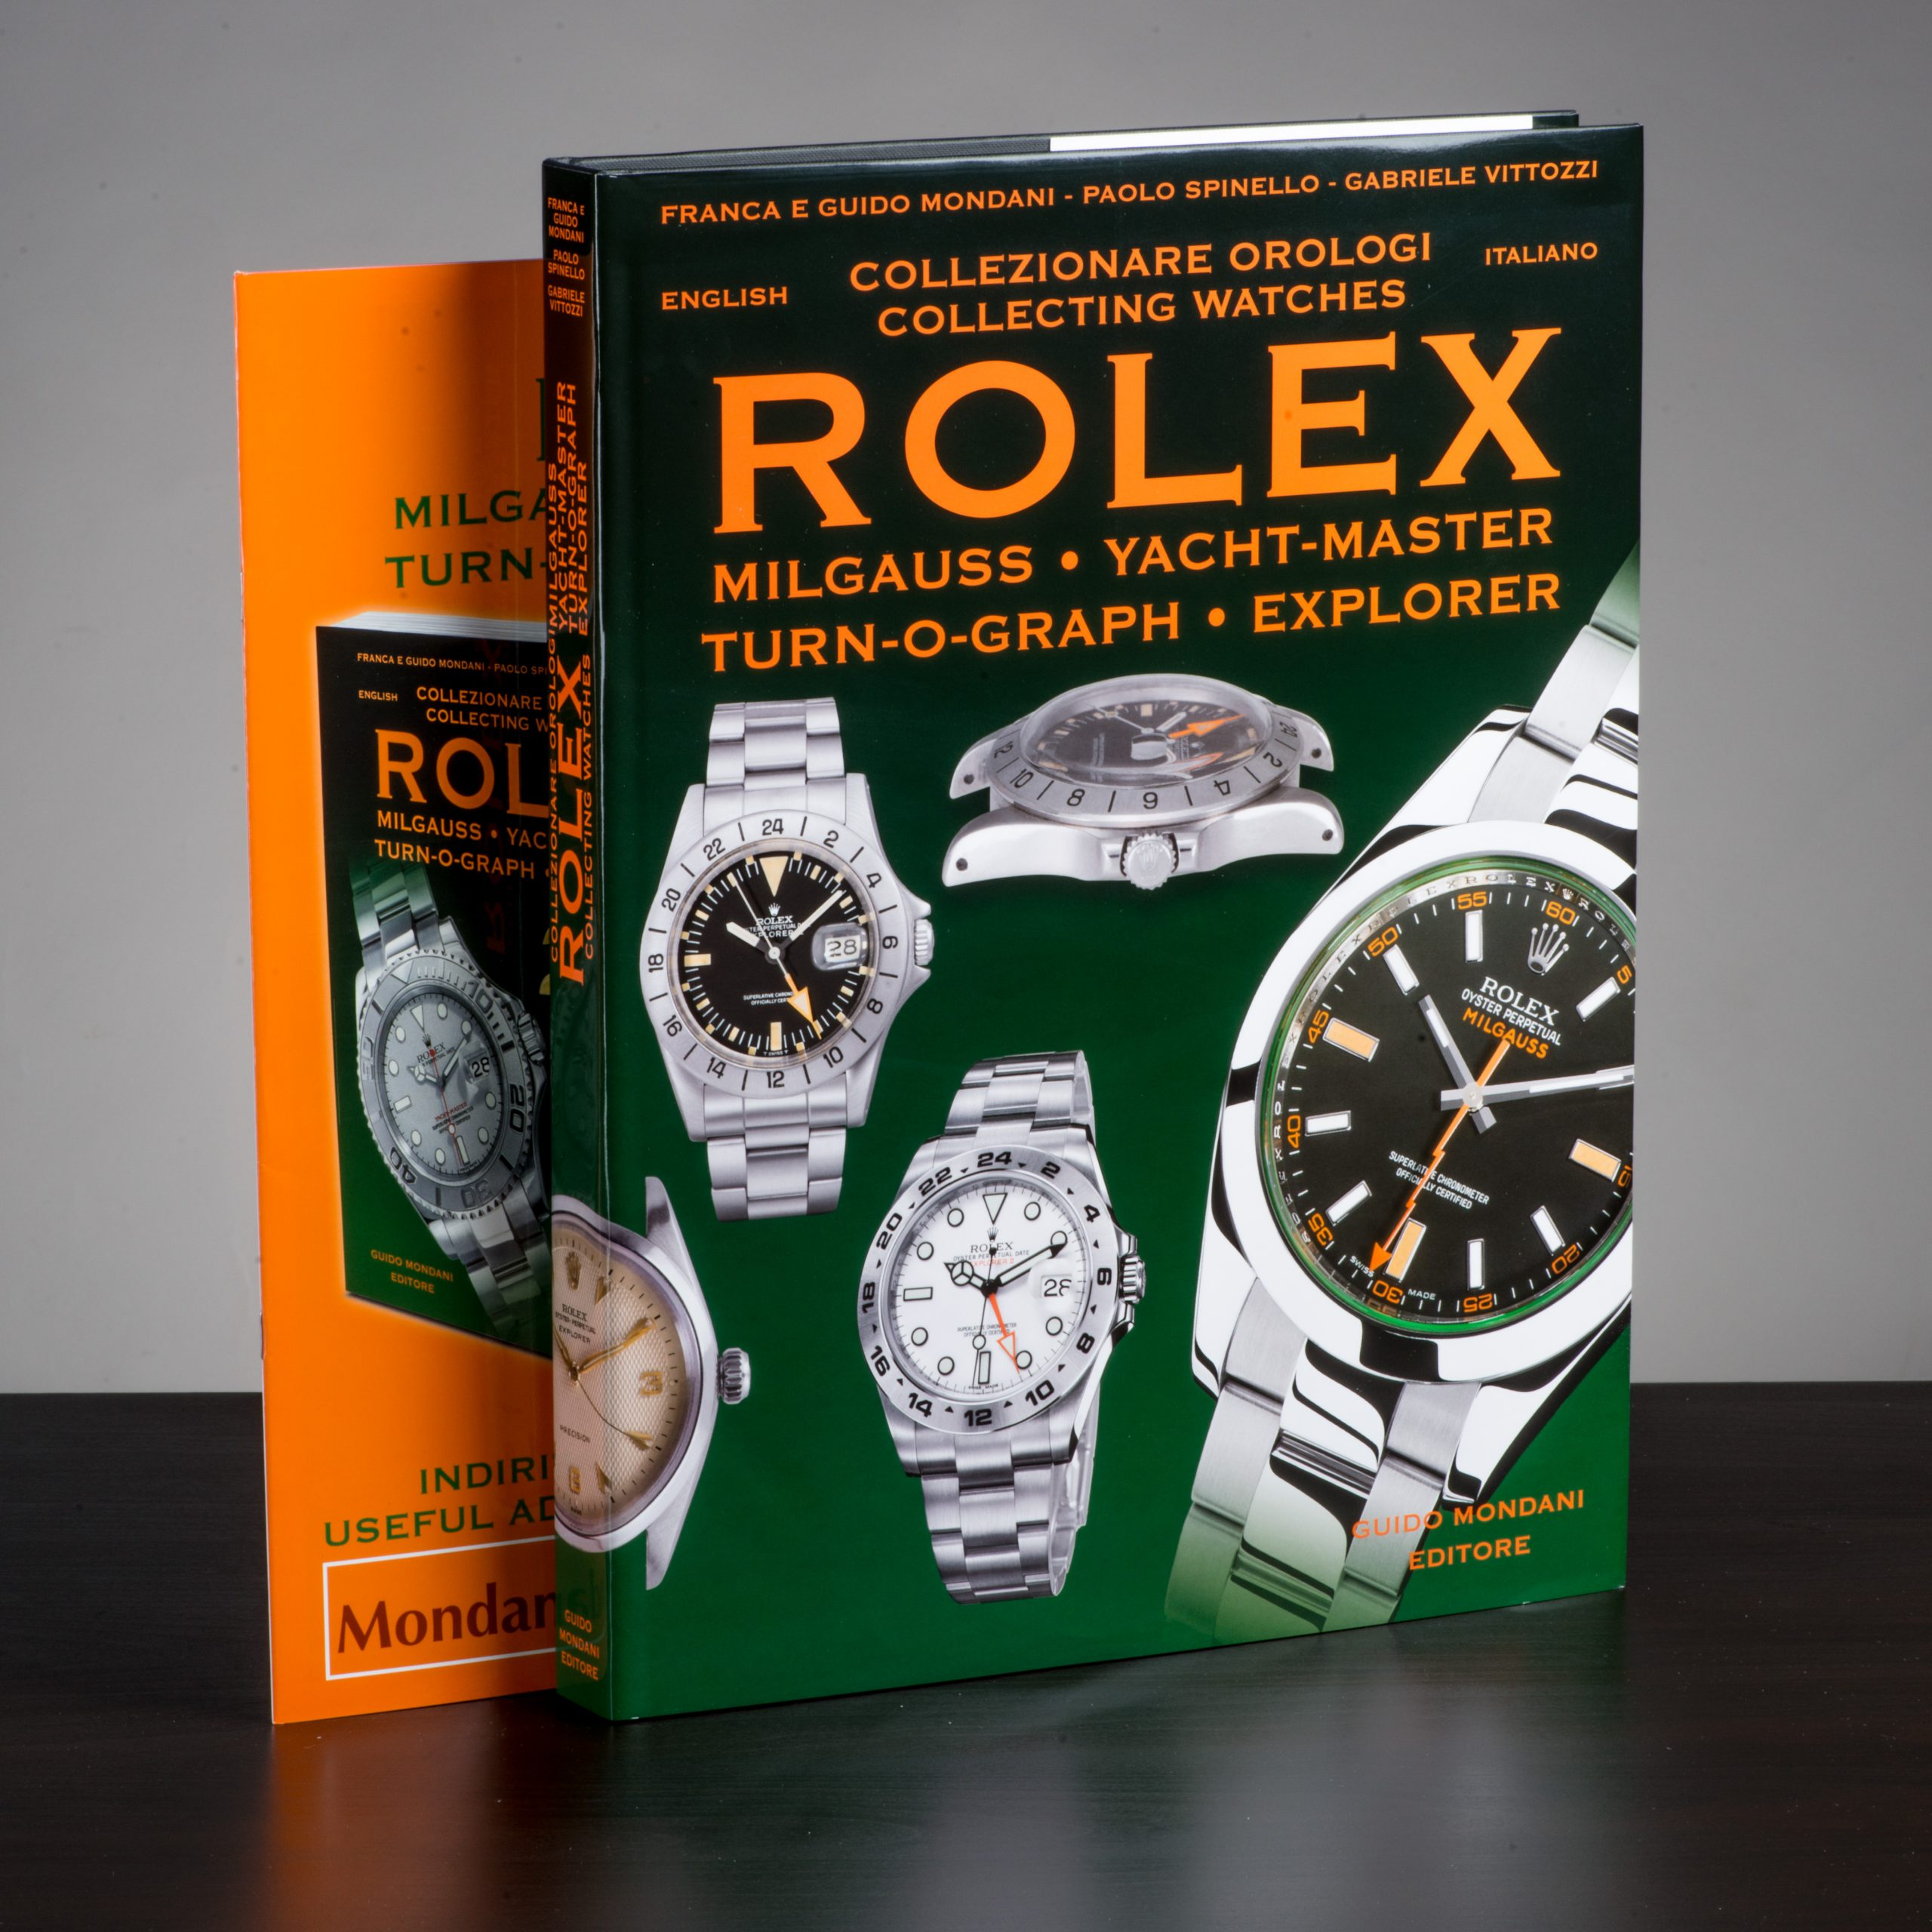 Rolex Milgauss, Yacht-Master, Turn-O-Graph & Explorer